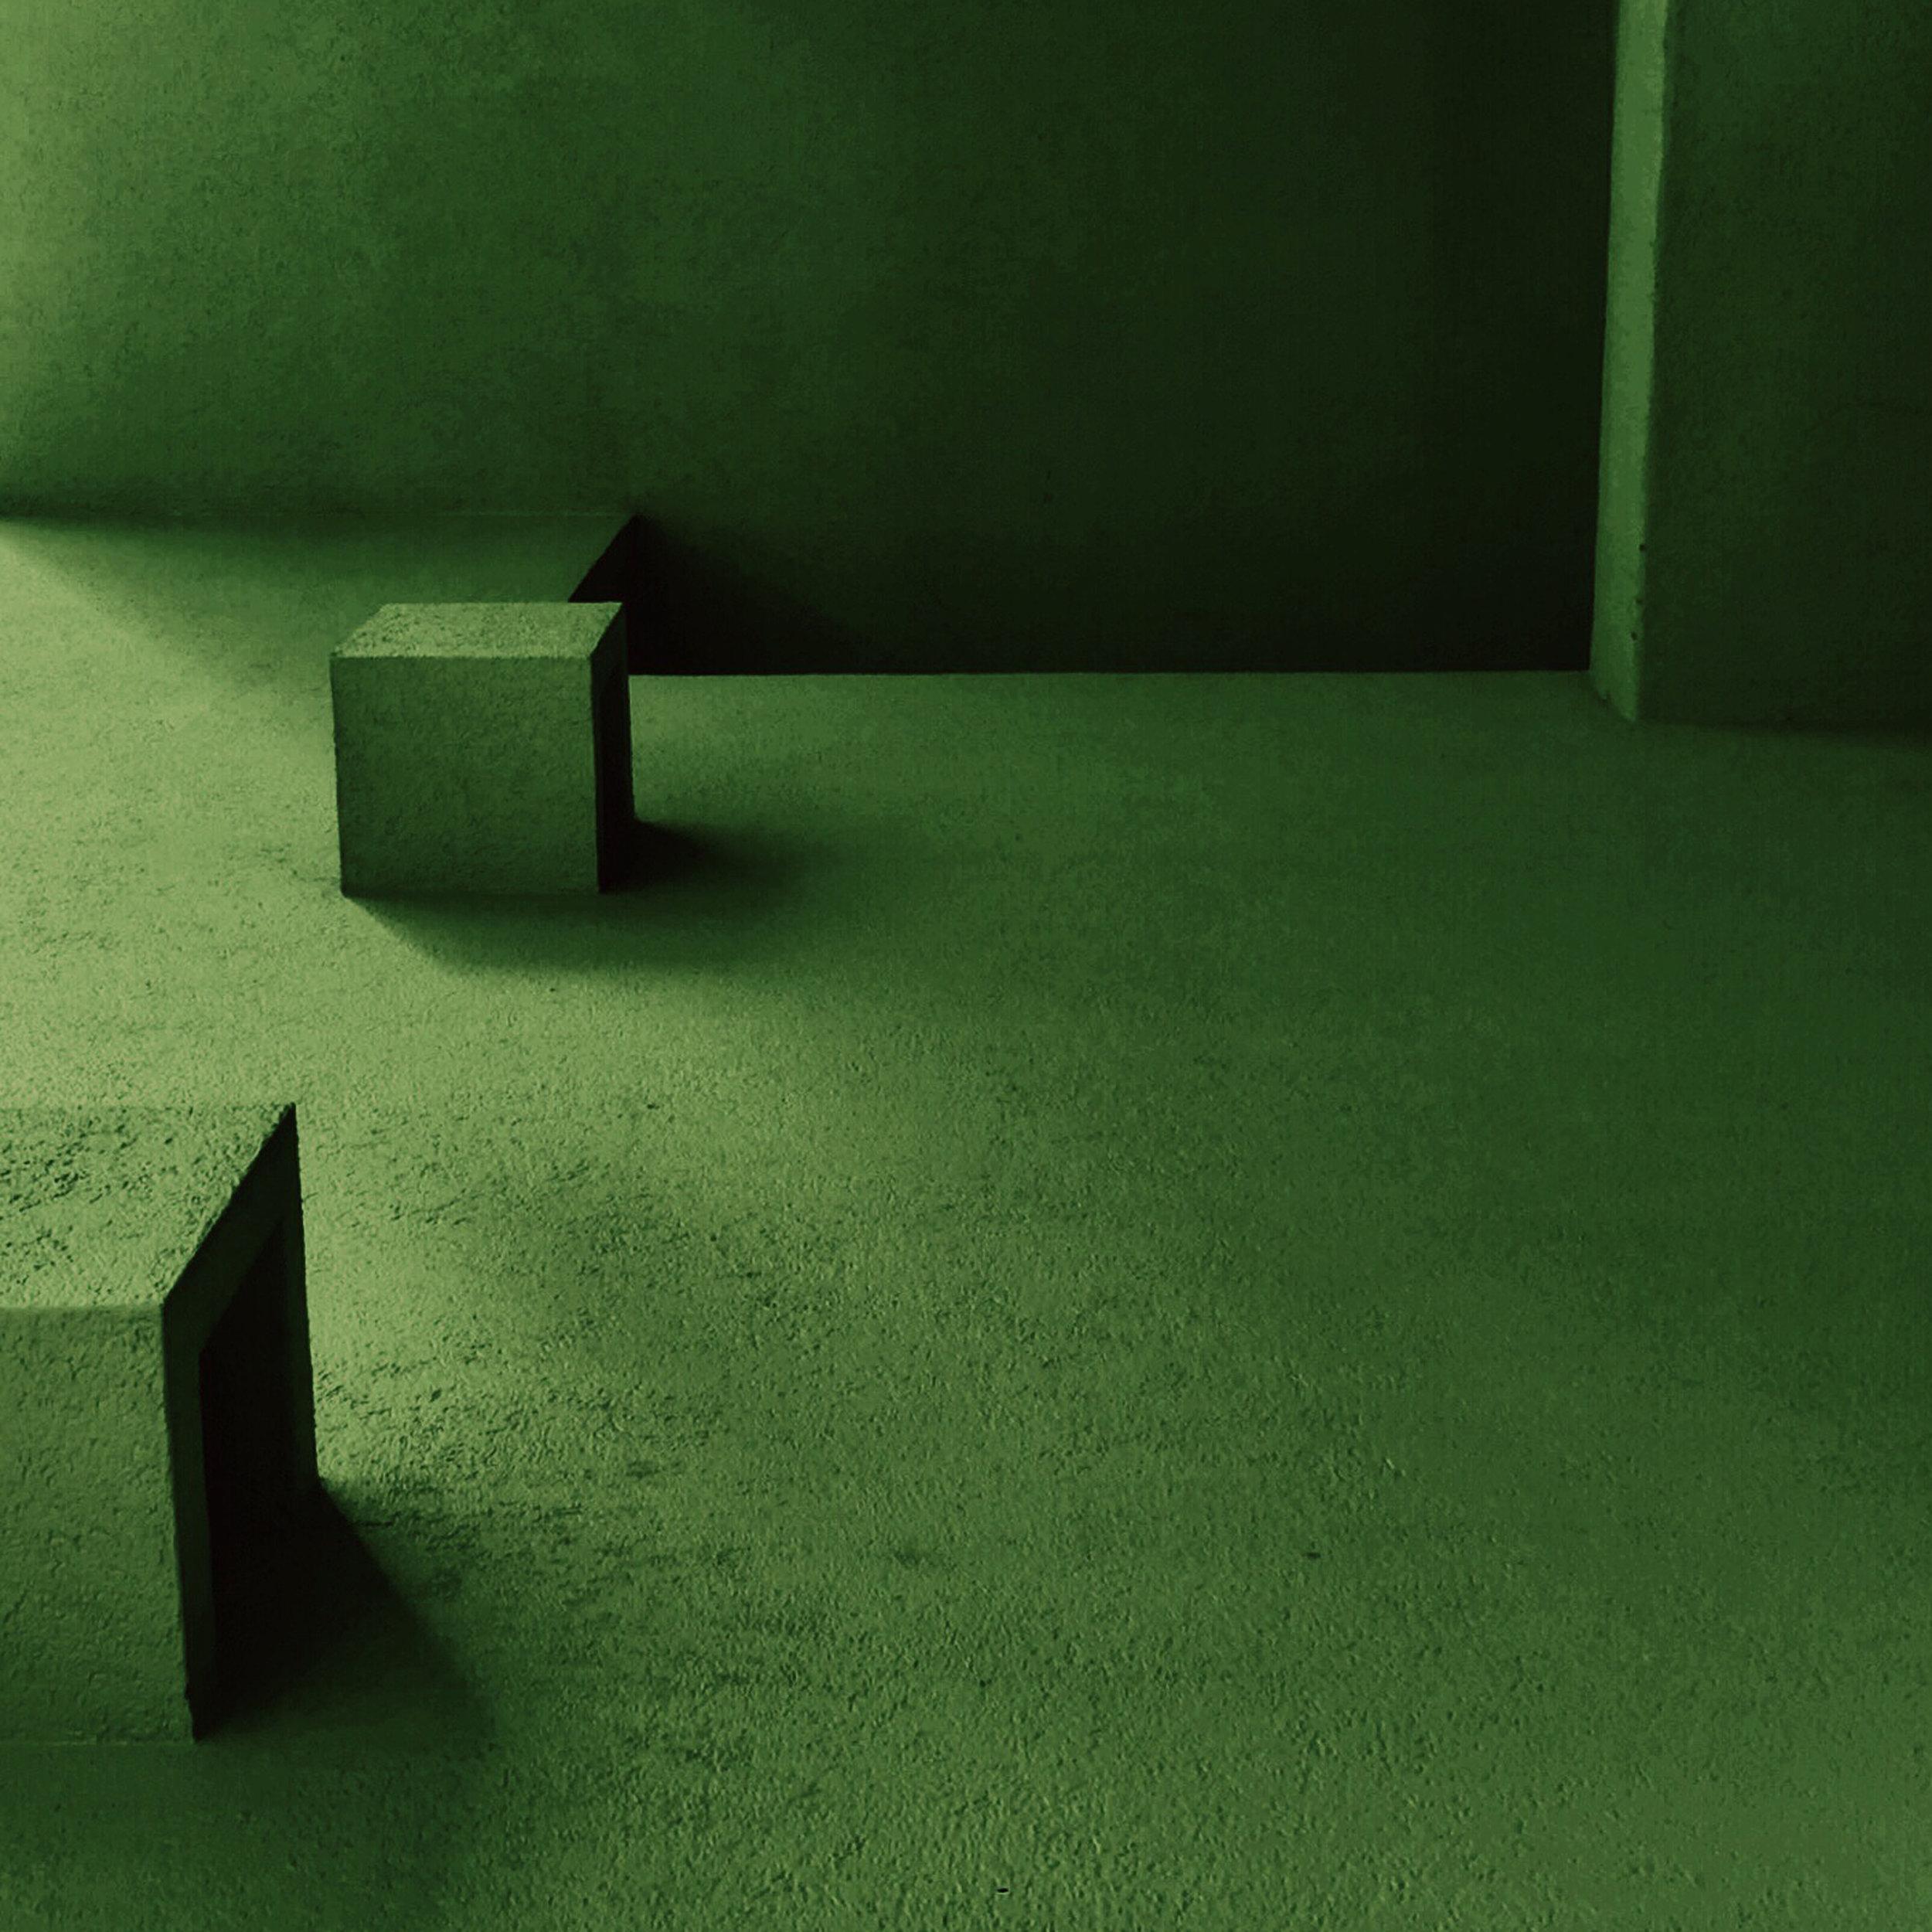 CC: Green